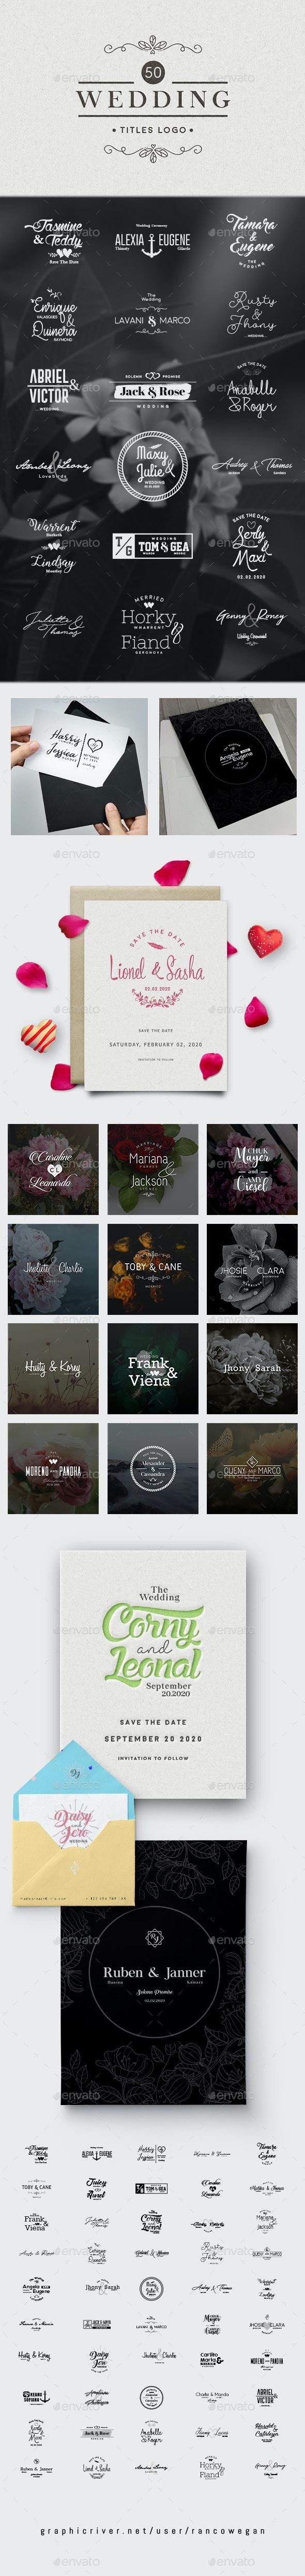 50 Wedding Titles Logo Vol. 2 - Badges & Stickers Web Elements